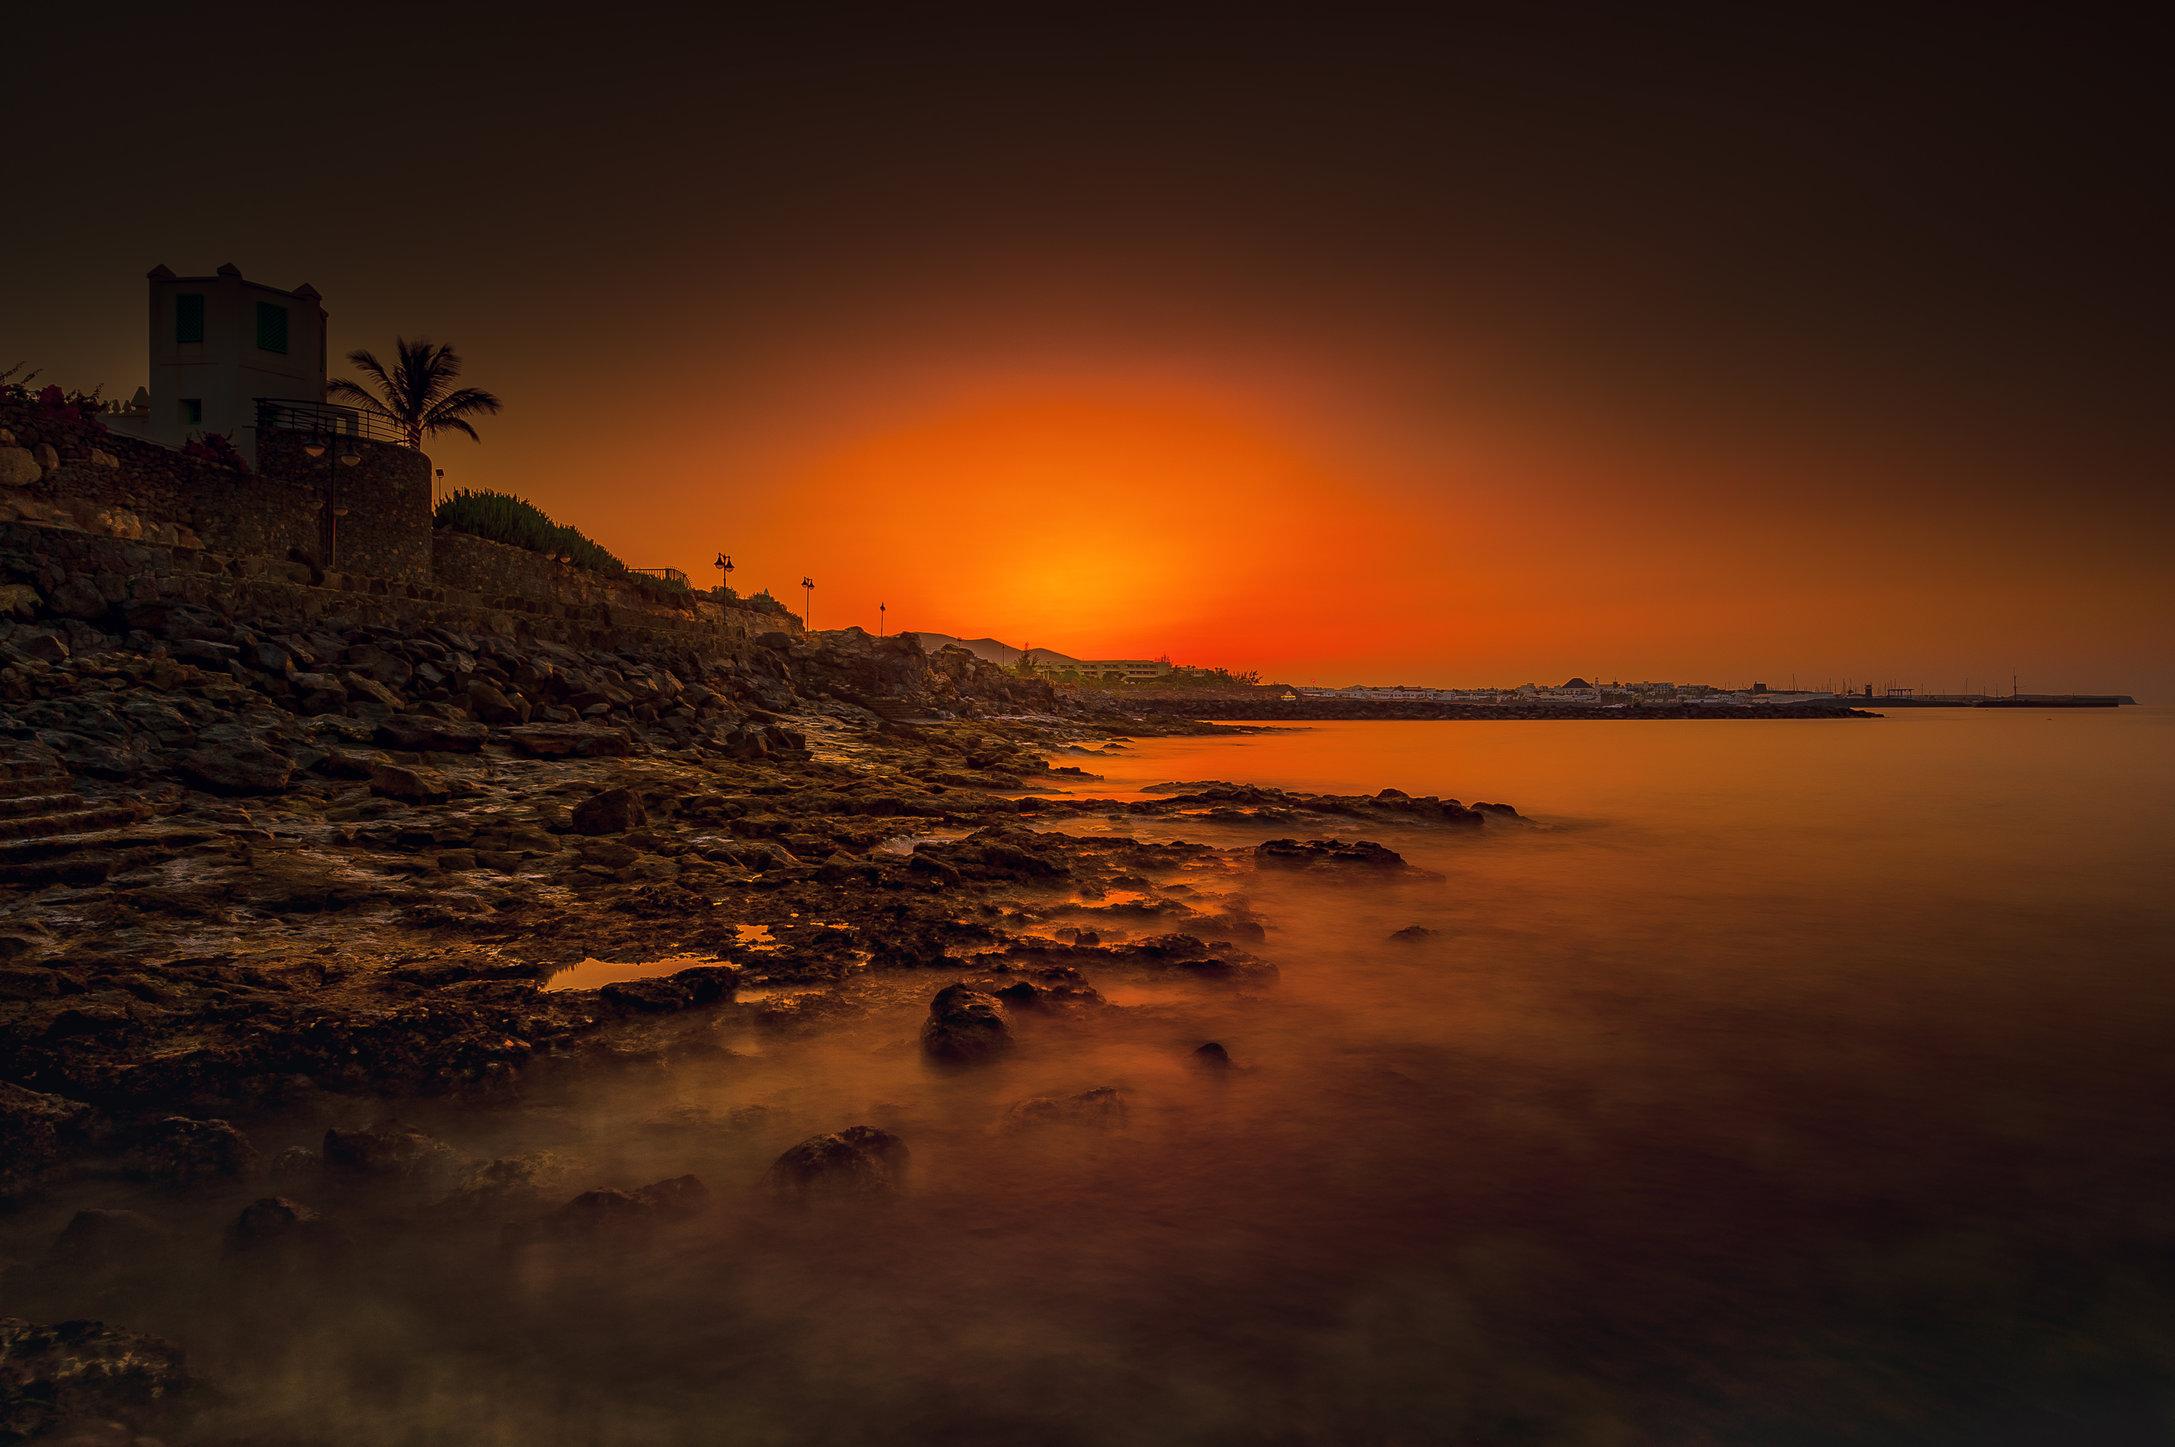 Salida del sol-MASTER COPY-1.jpg